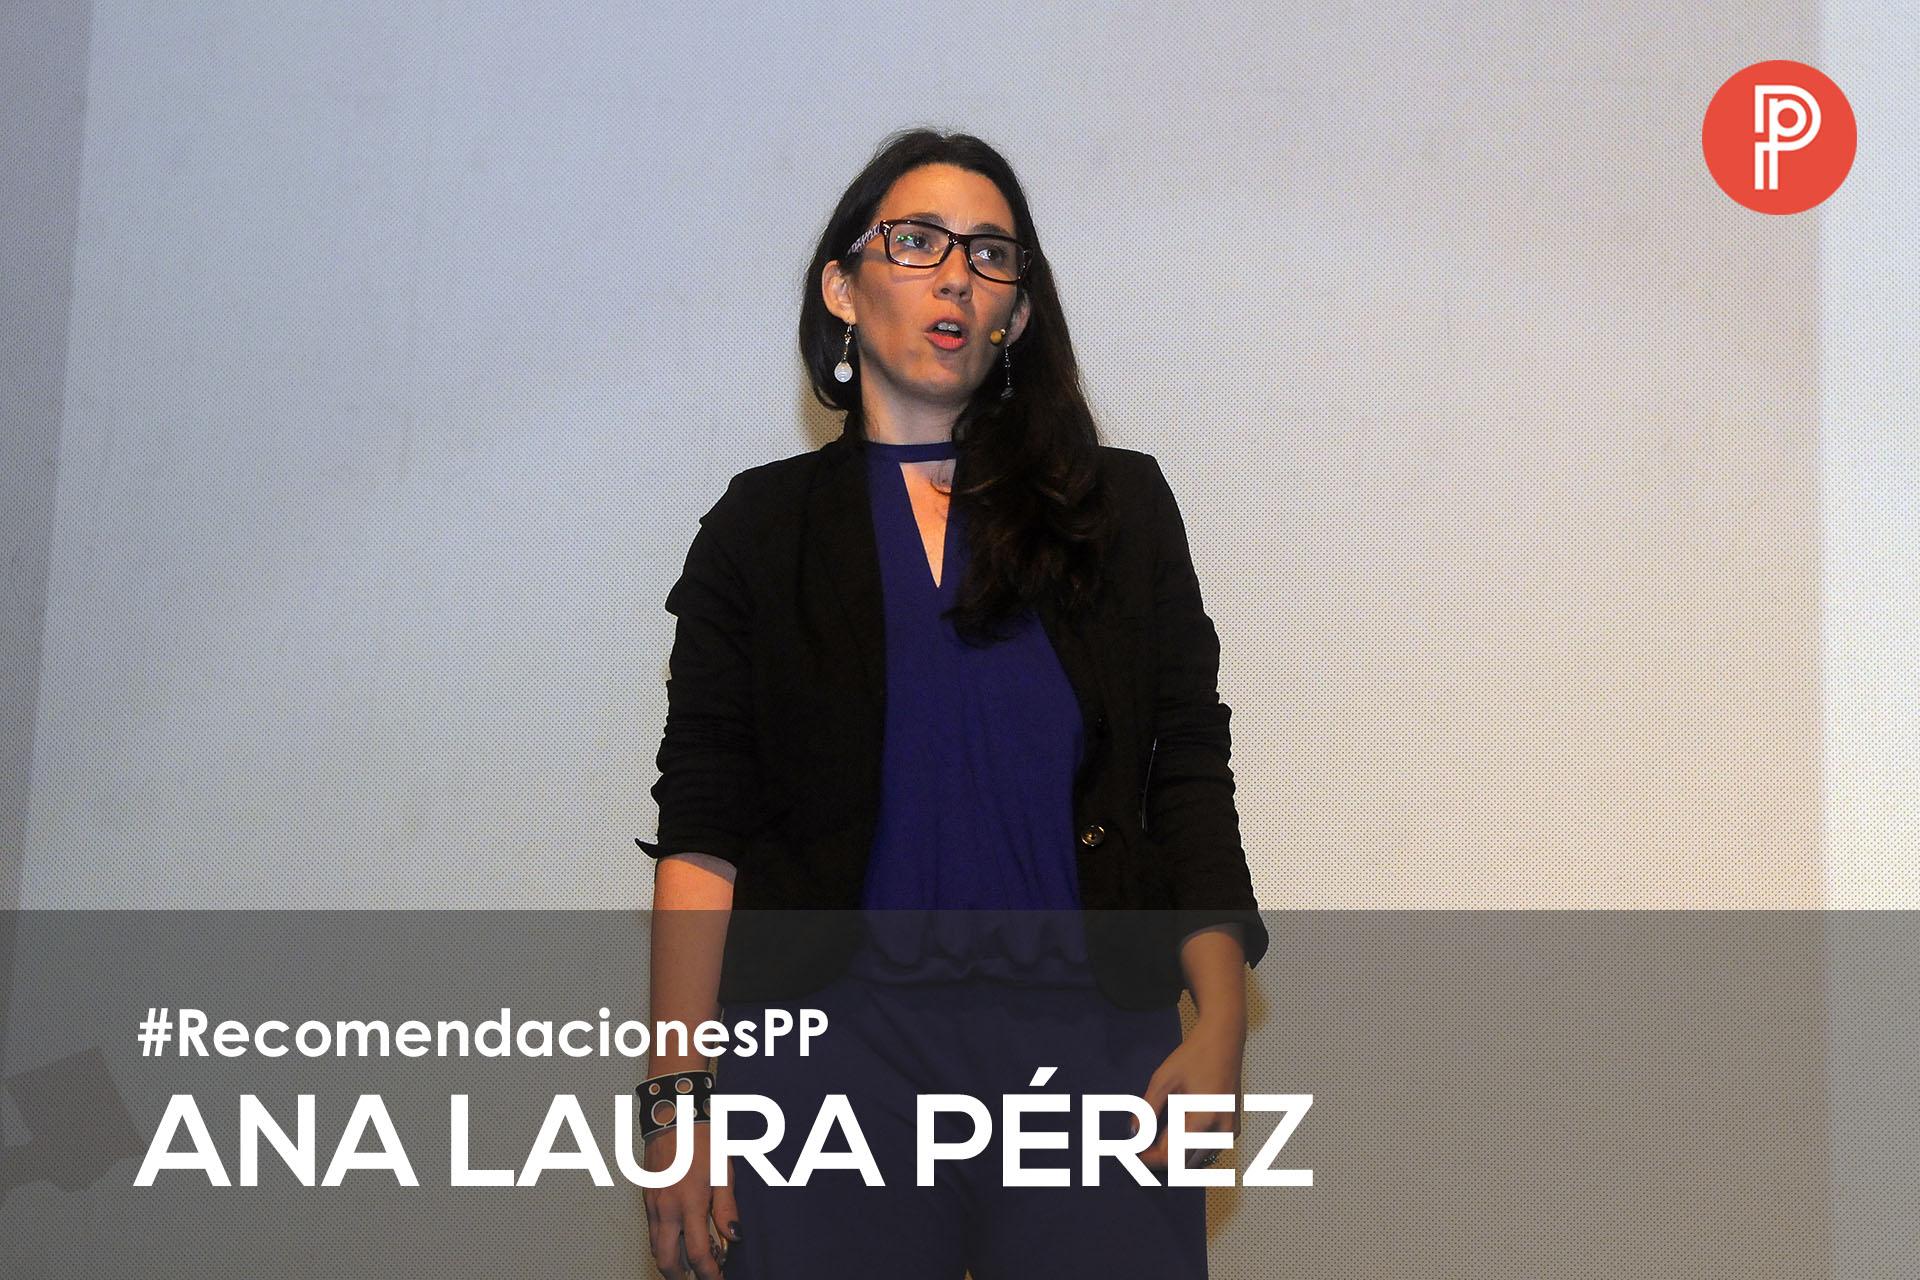 ana_laura_perez_recomendacionesPP